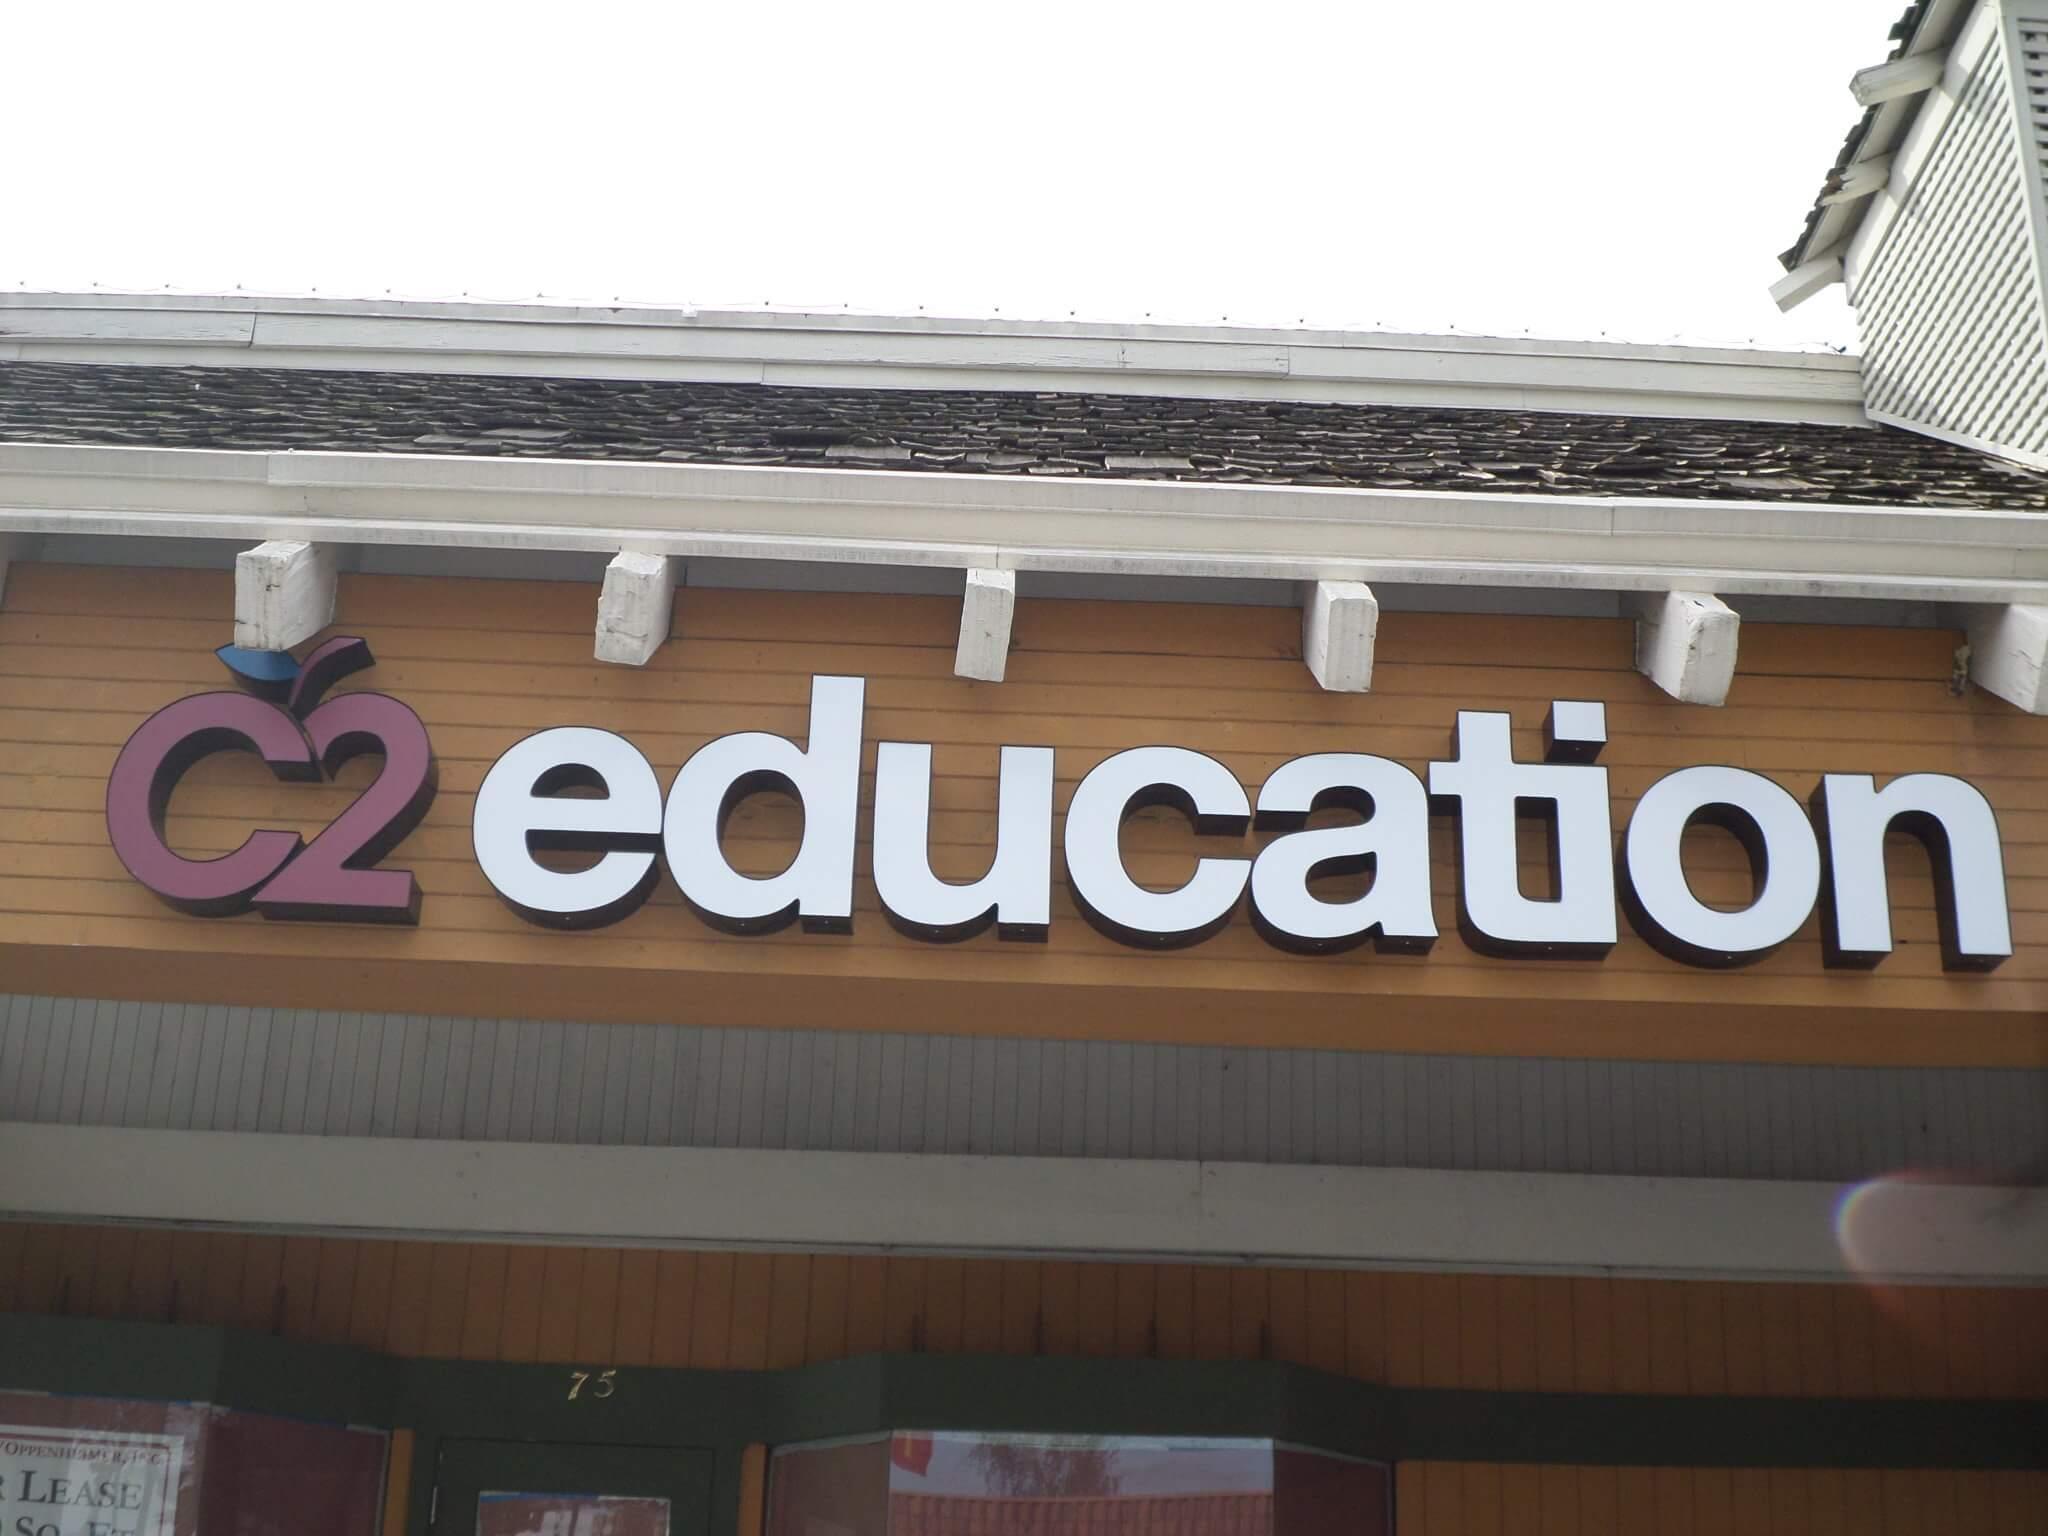 Font (face) lit Channel Letter signage for C2 Education Milpitas, CA